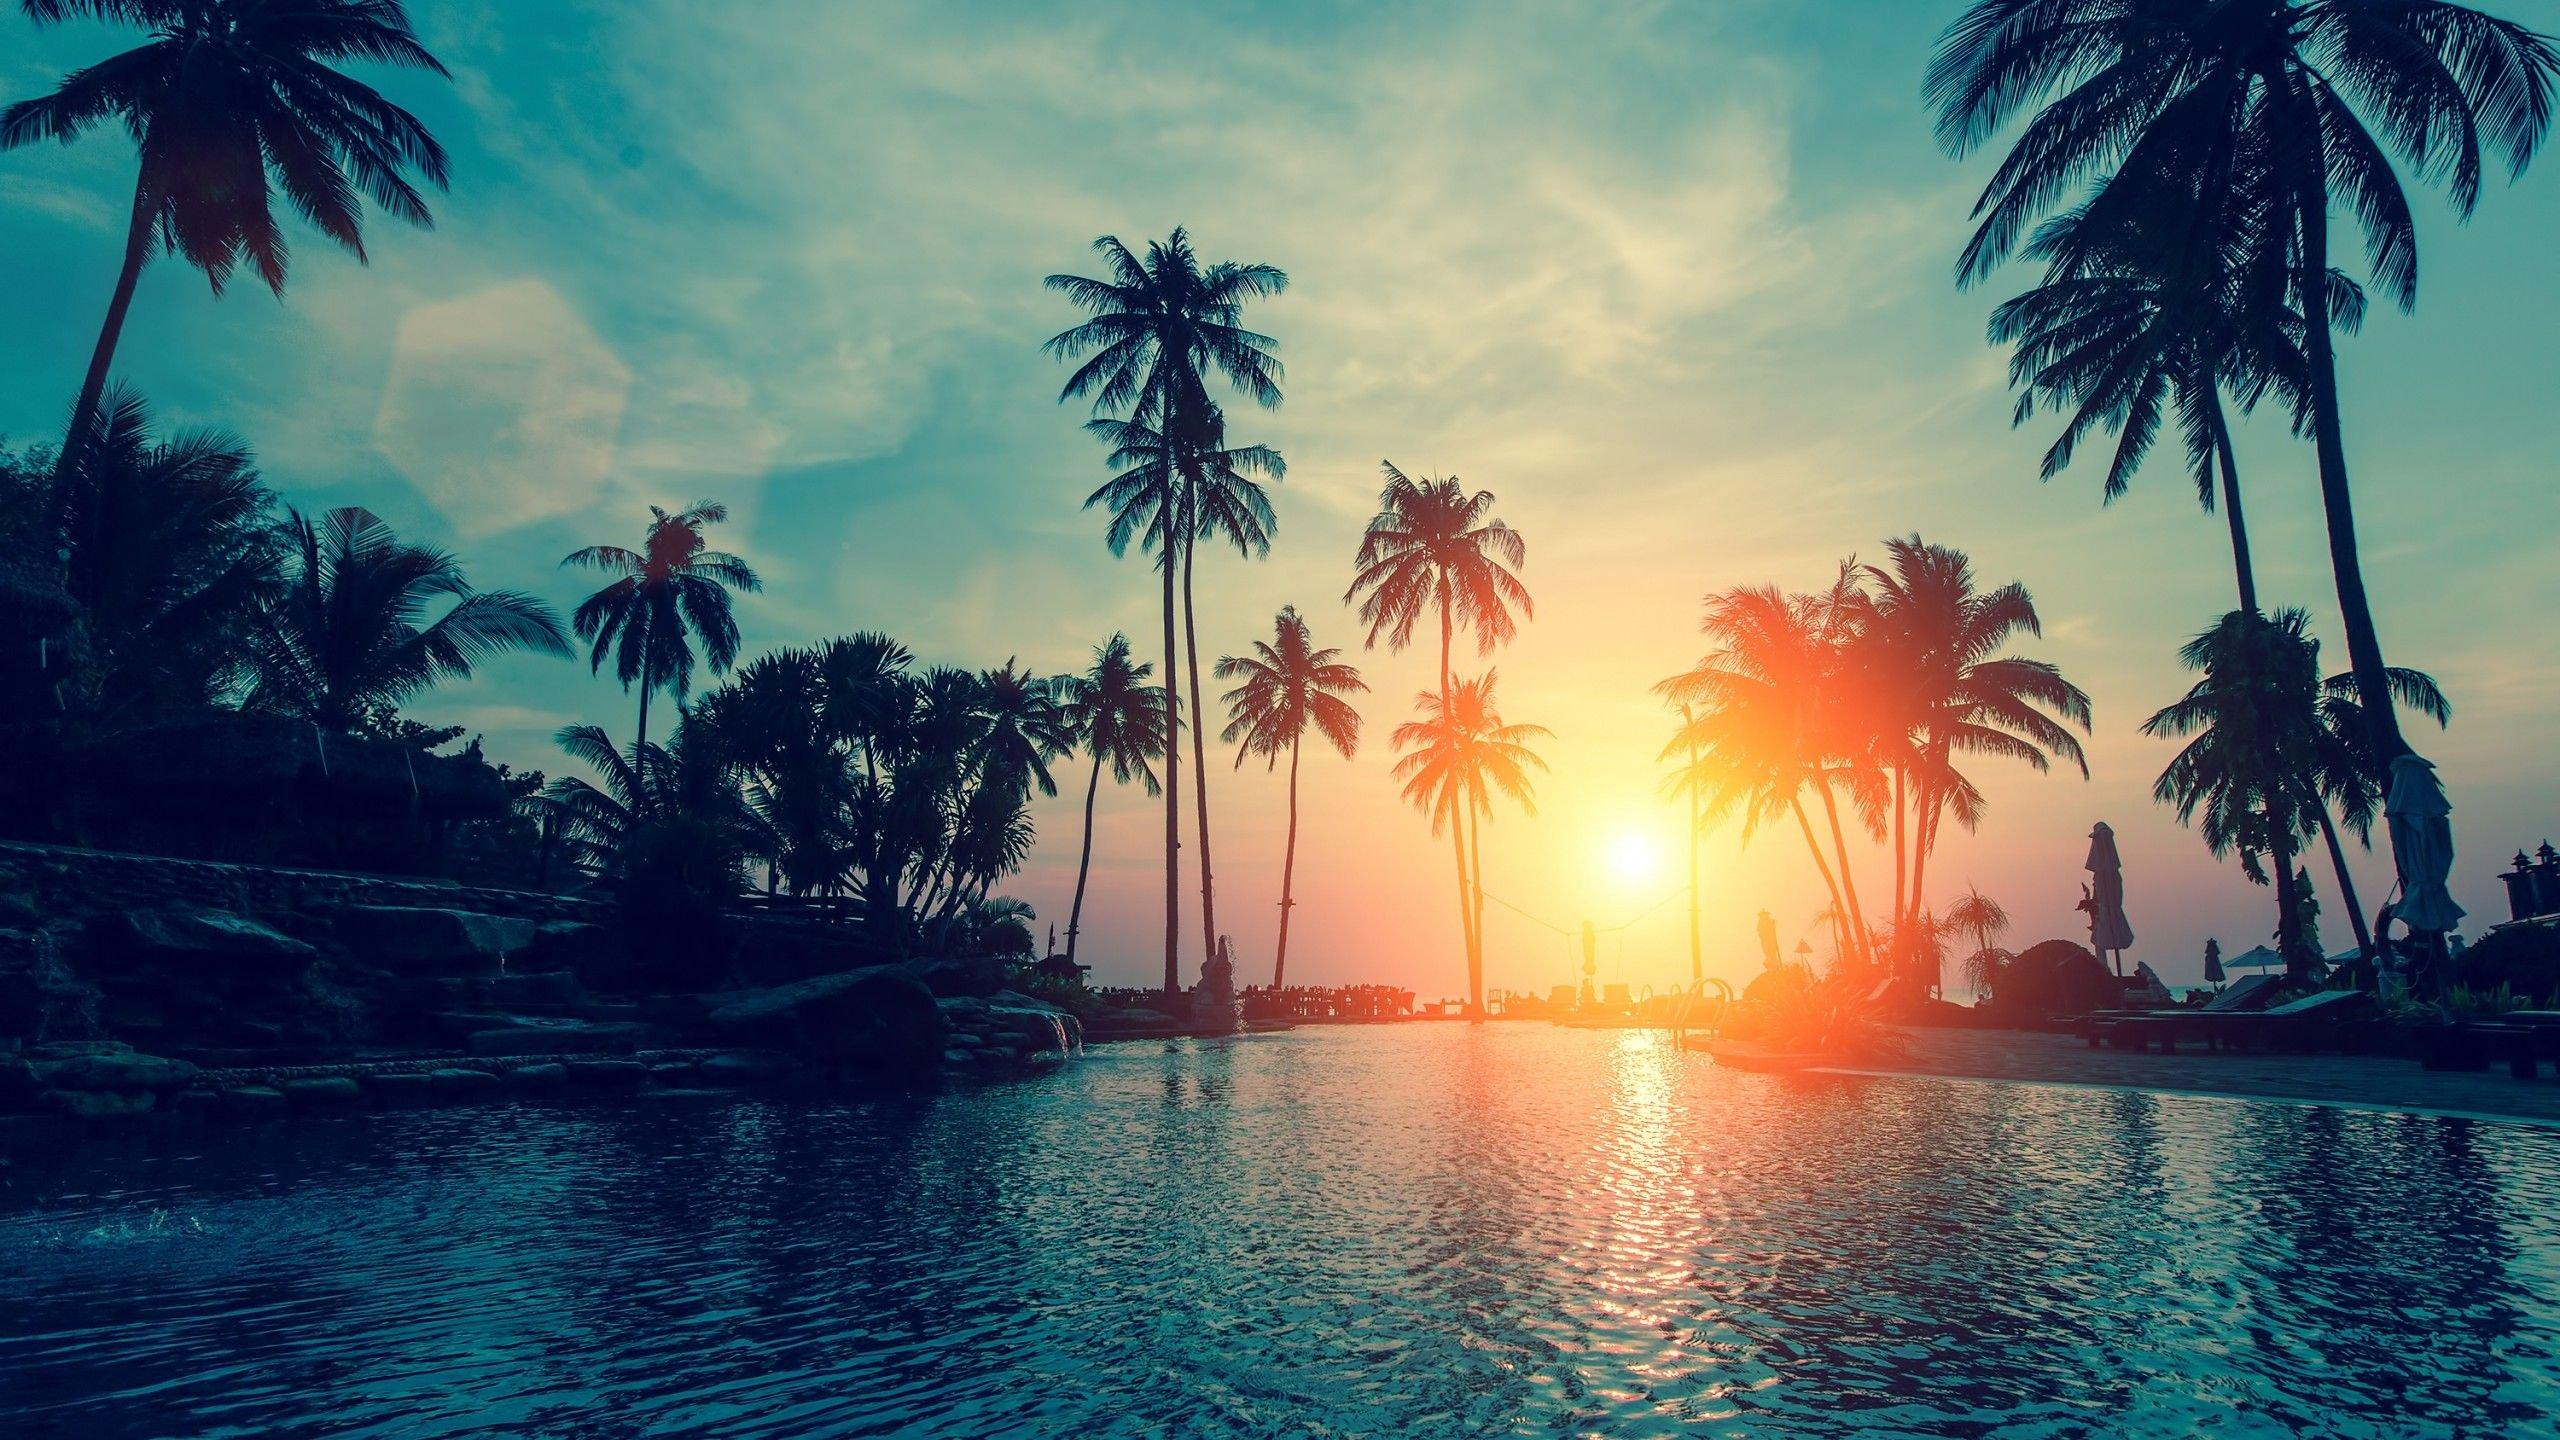 Palm Tree Screensaver desktop wallpaper download